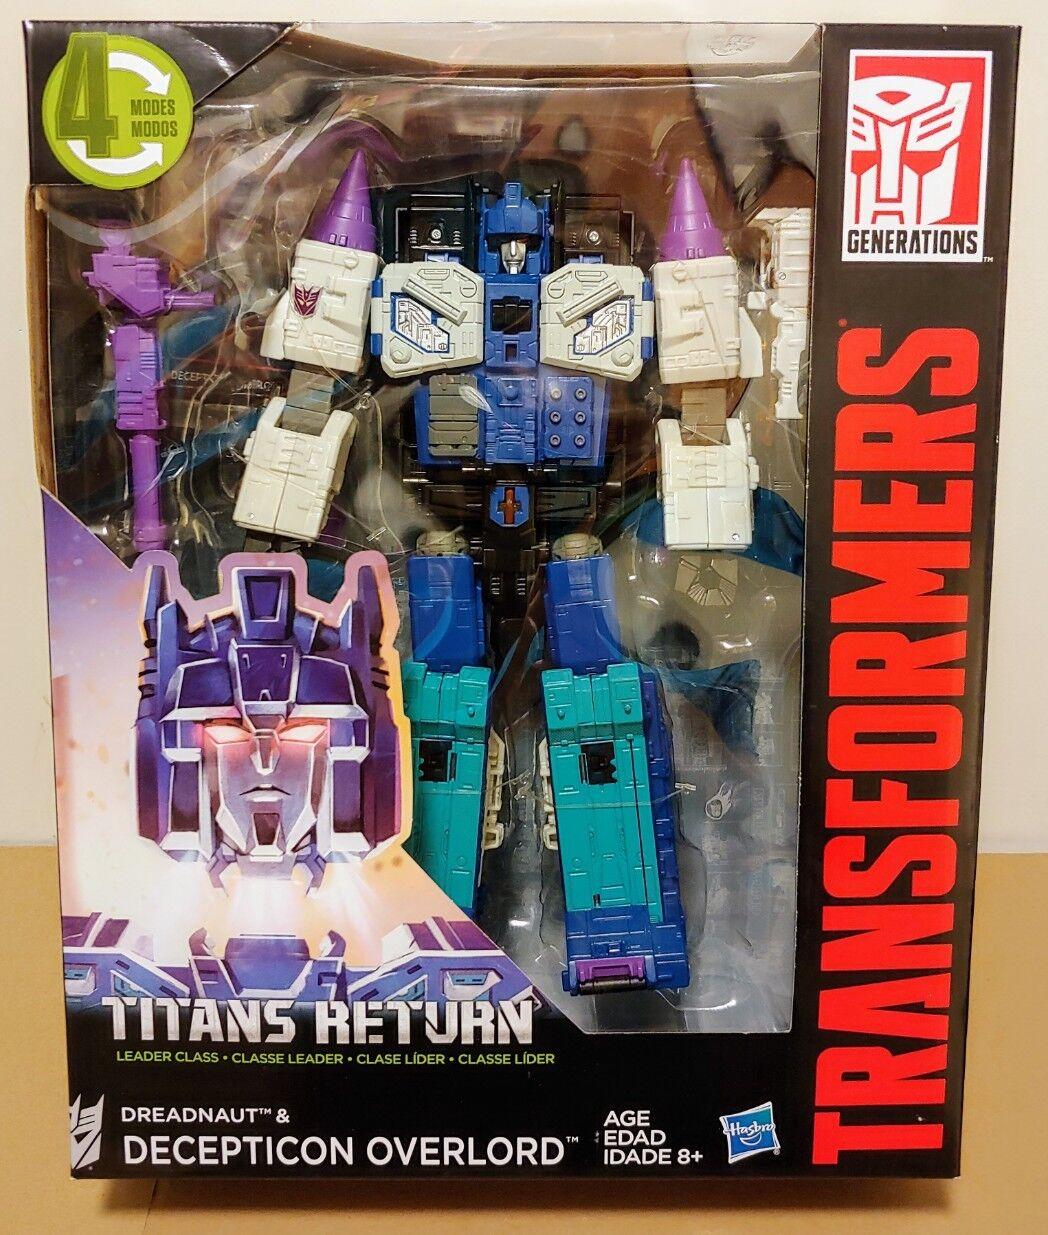 Transformers Titans Return Decepticon Dreadnaut Dreadnaut Dreadnaut & Overlord - Leader Class - New 96d961